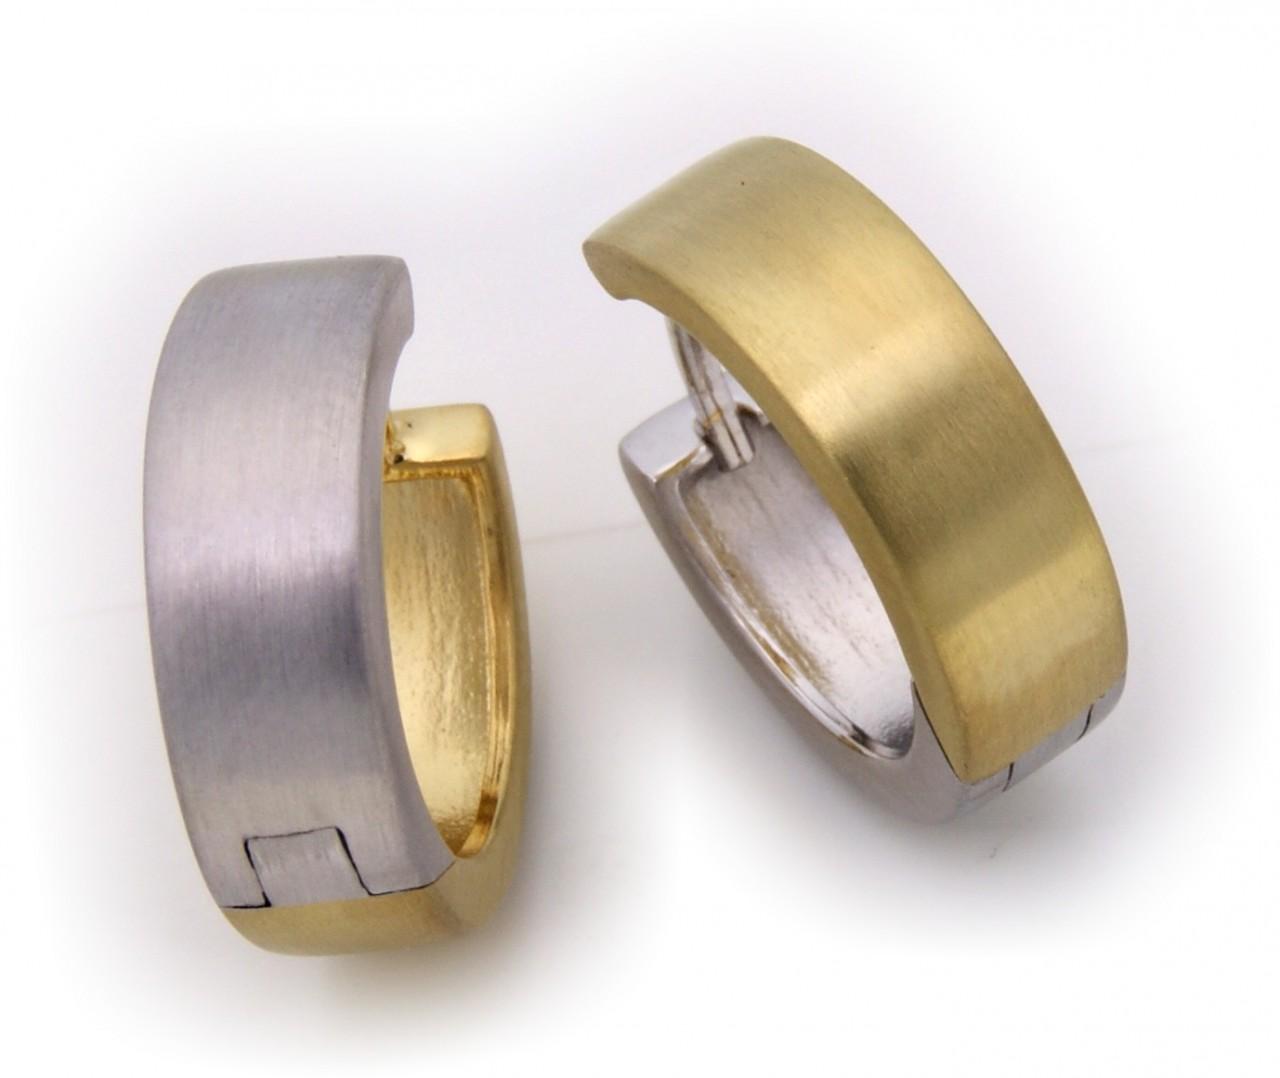 Ohrringe Klapp-Creolen eckig echt Silber 925 Bicolor 17 mm Sterlingsilber gelb weiß mattiert